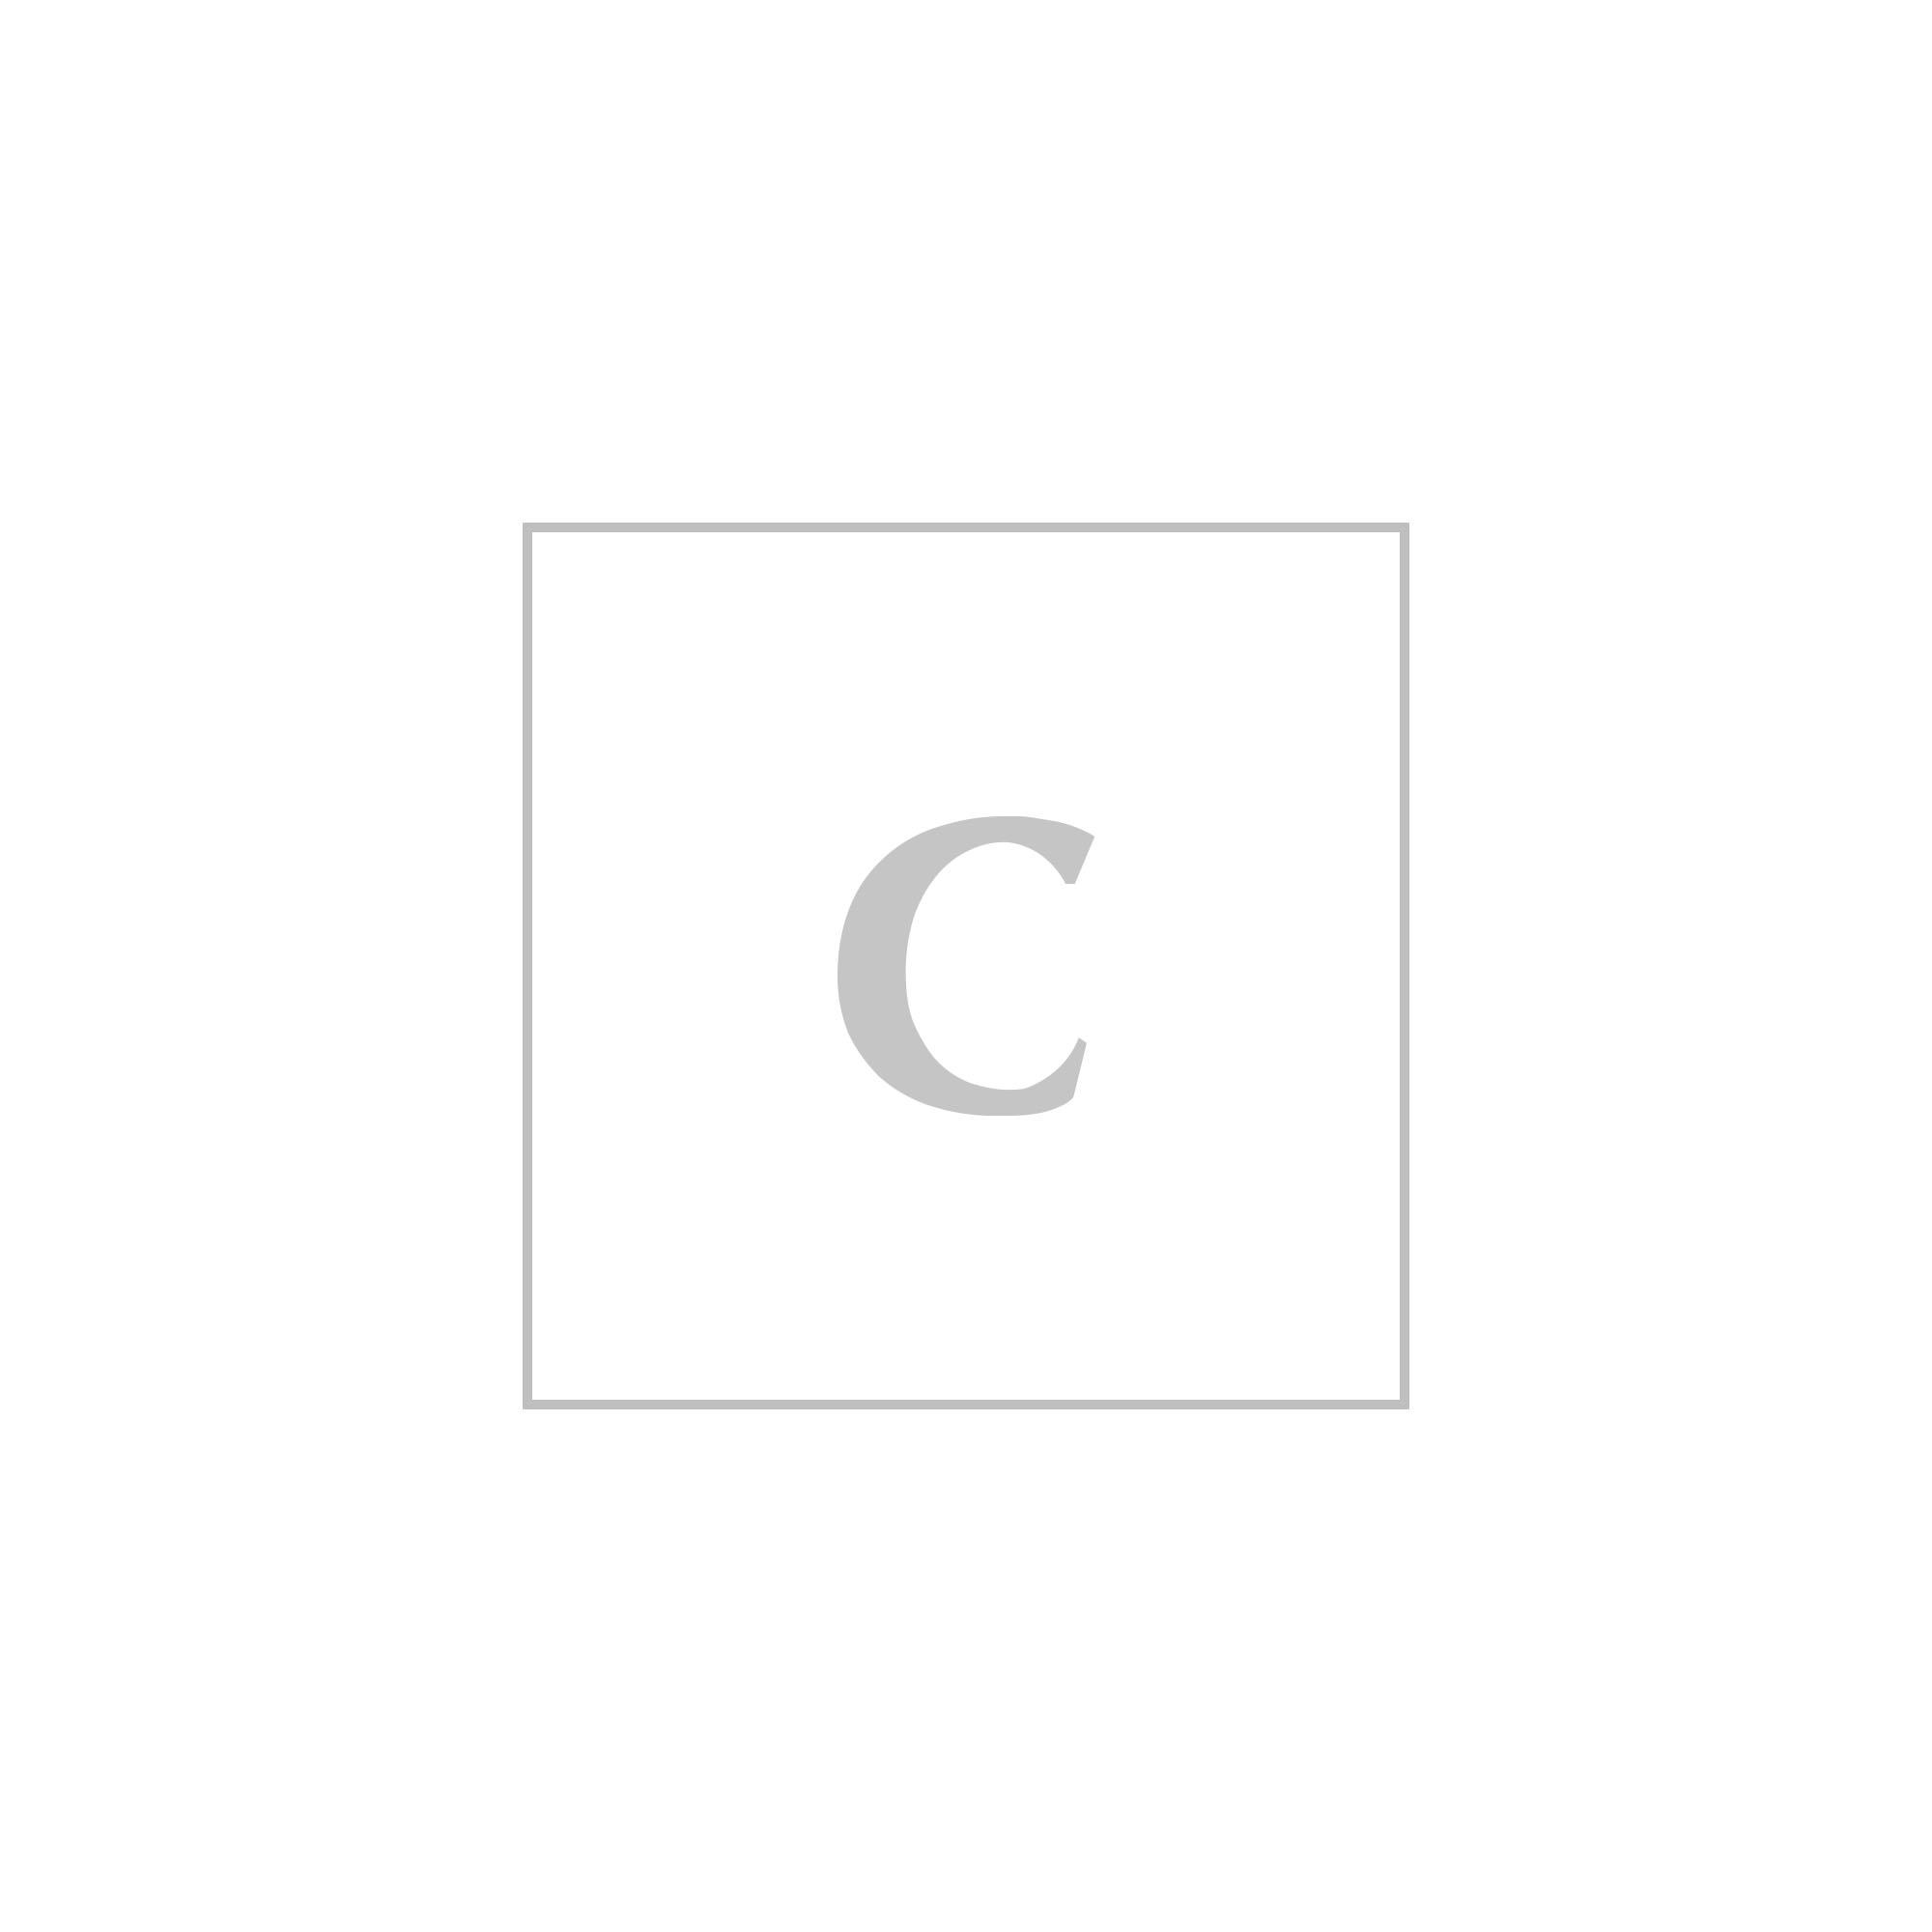 Chiara ferragni piercing beanie